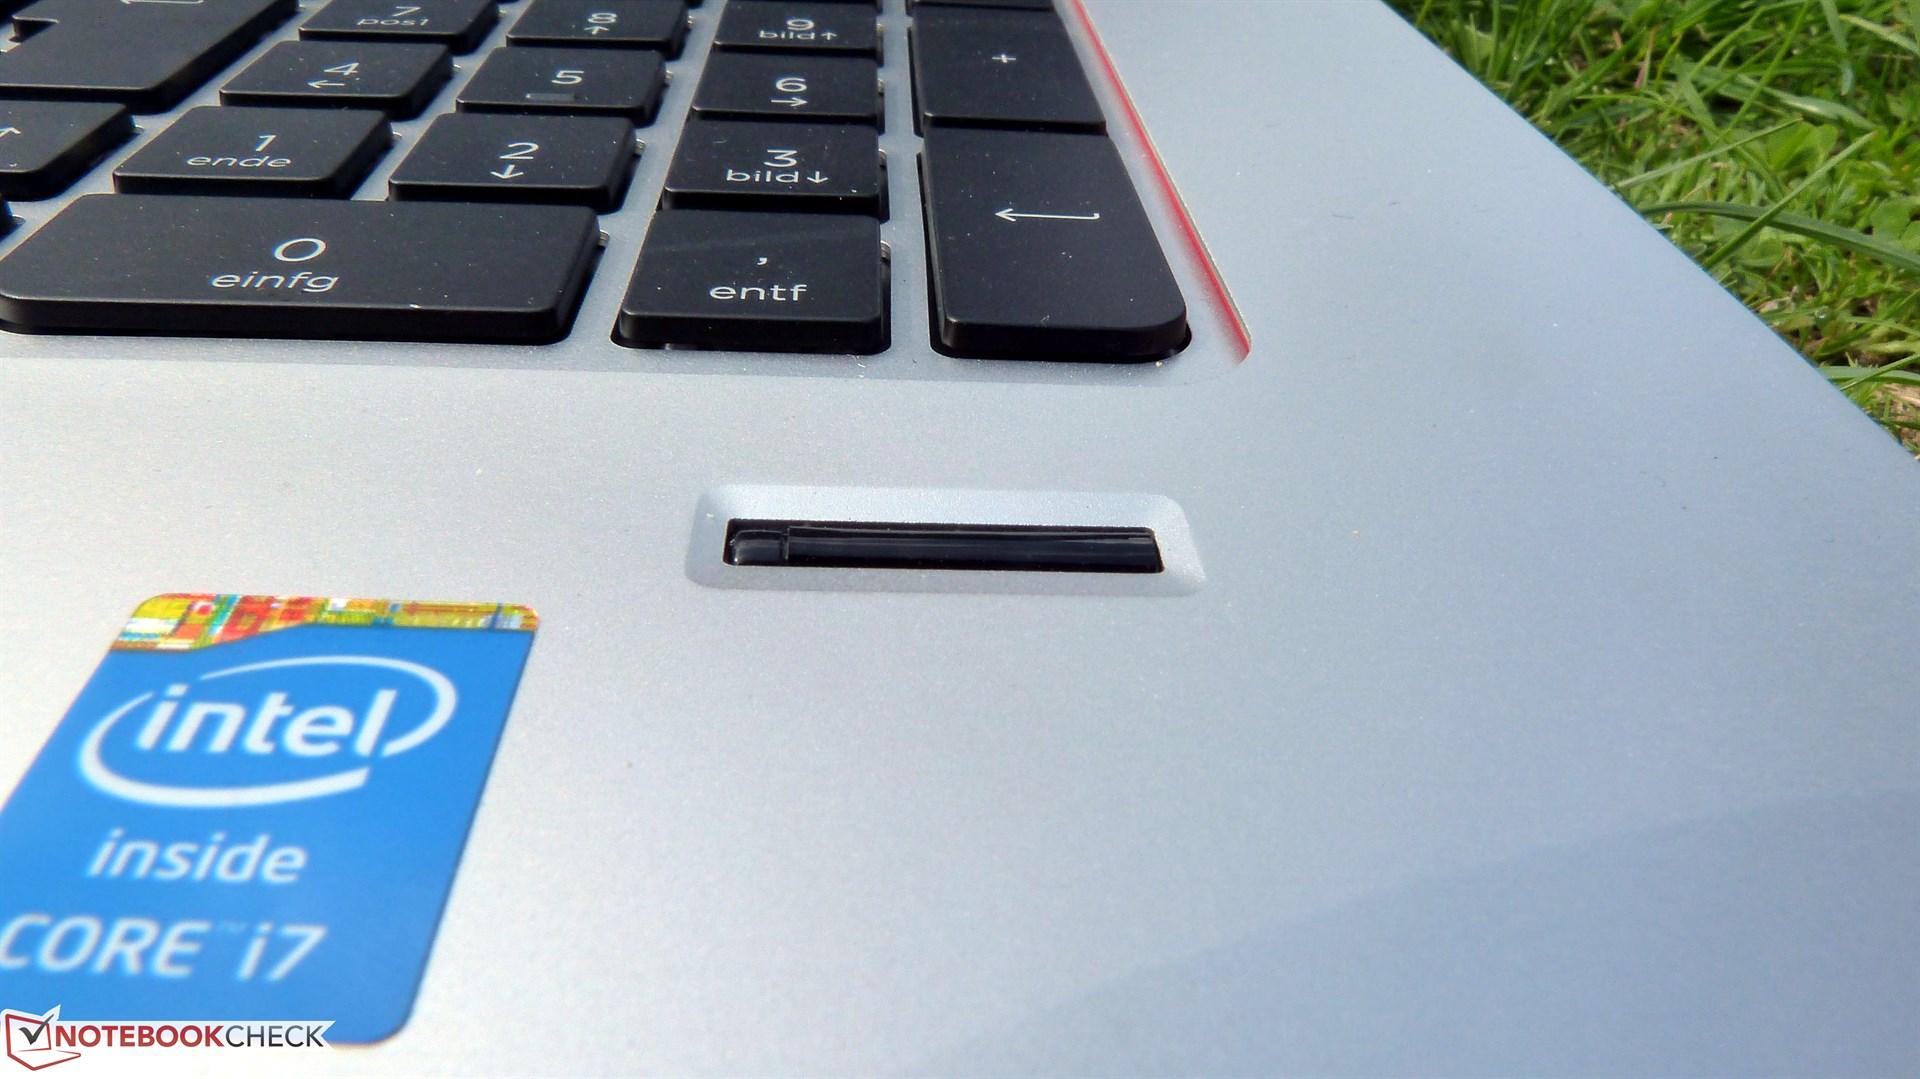 Hp laptop fingerprint software free download